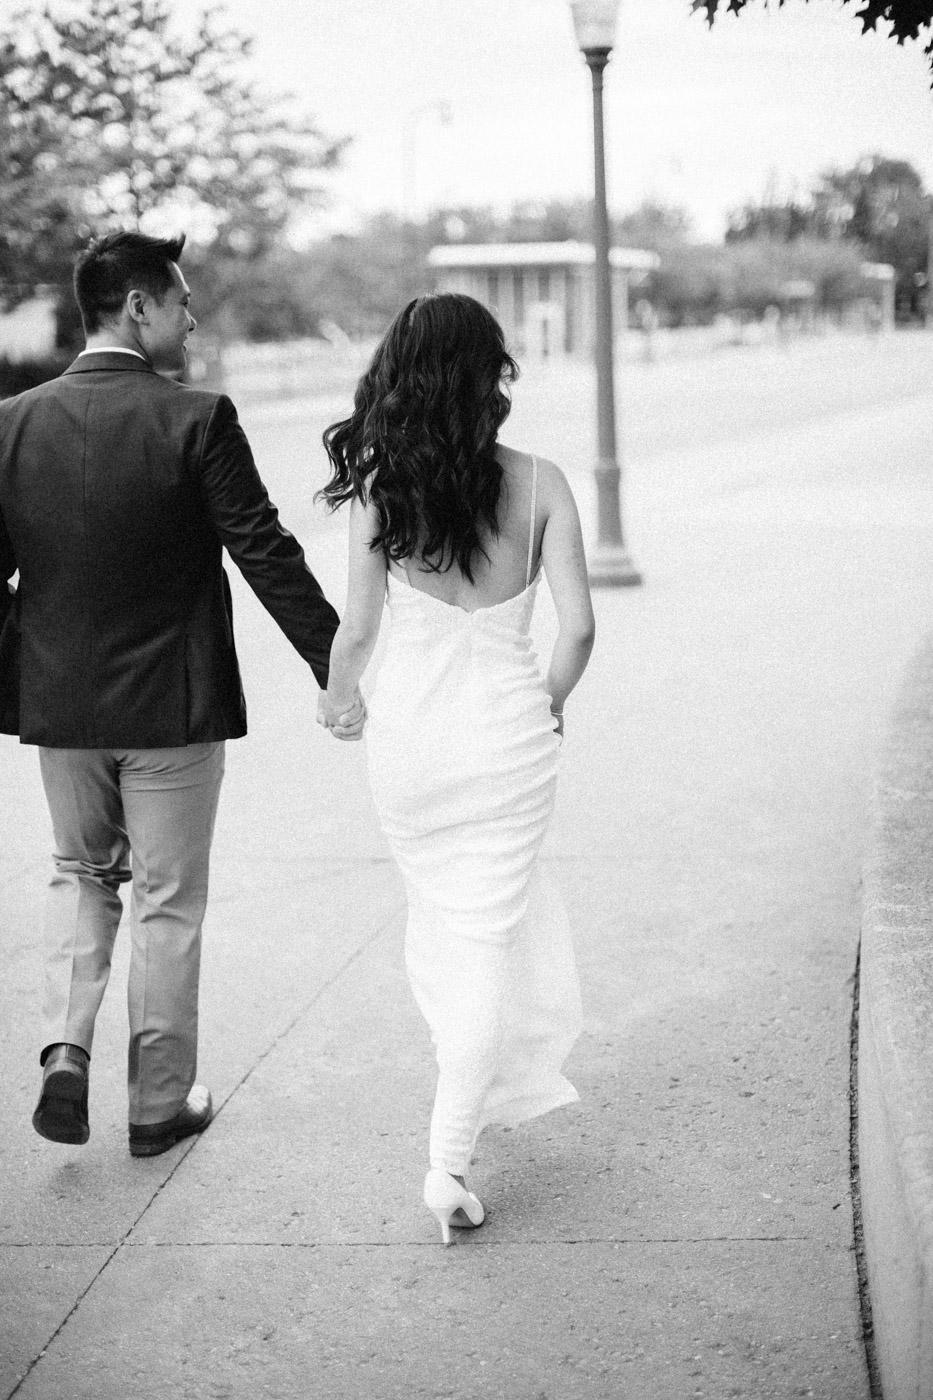 toronto_wedding_photographer_fine_art_documentary 2017-68.jpg